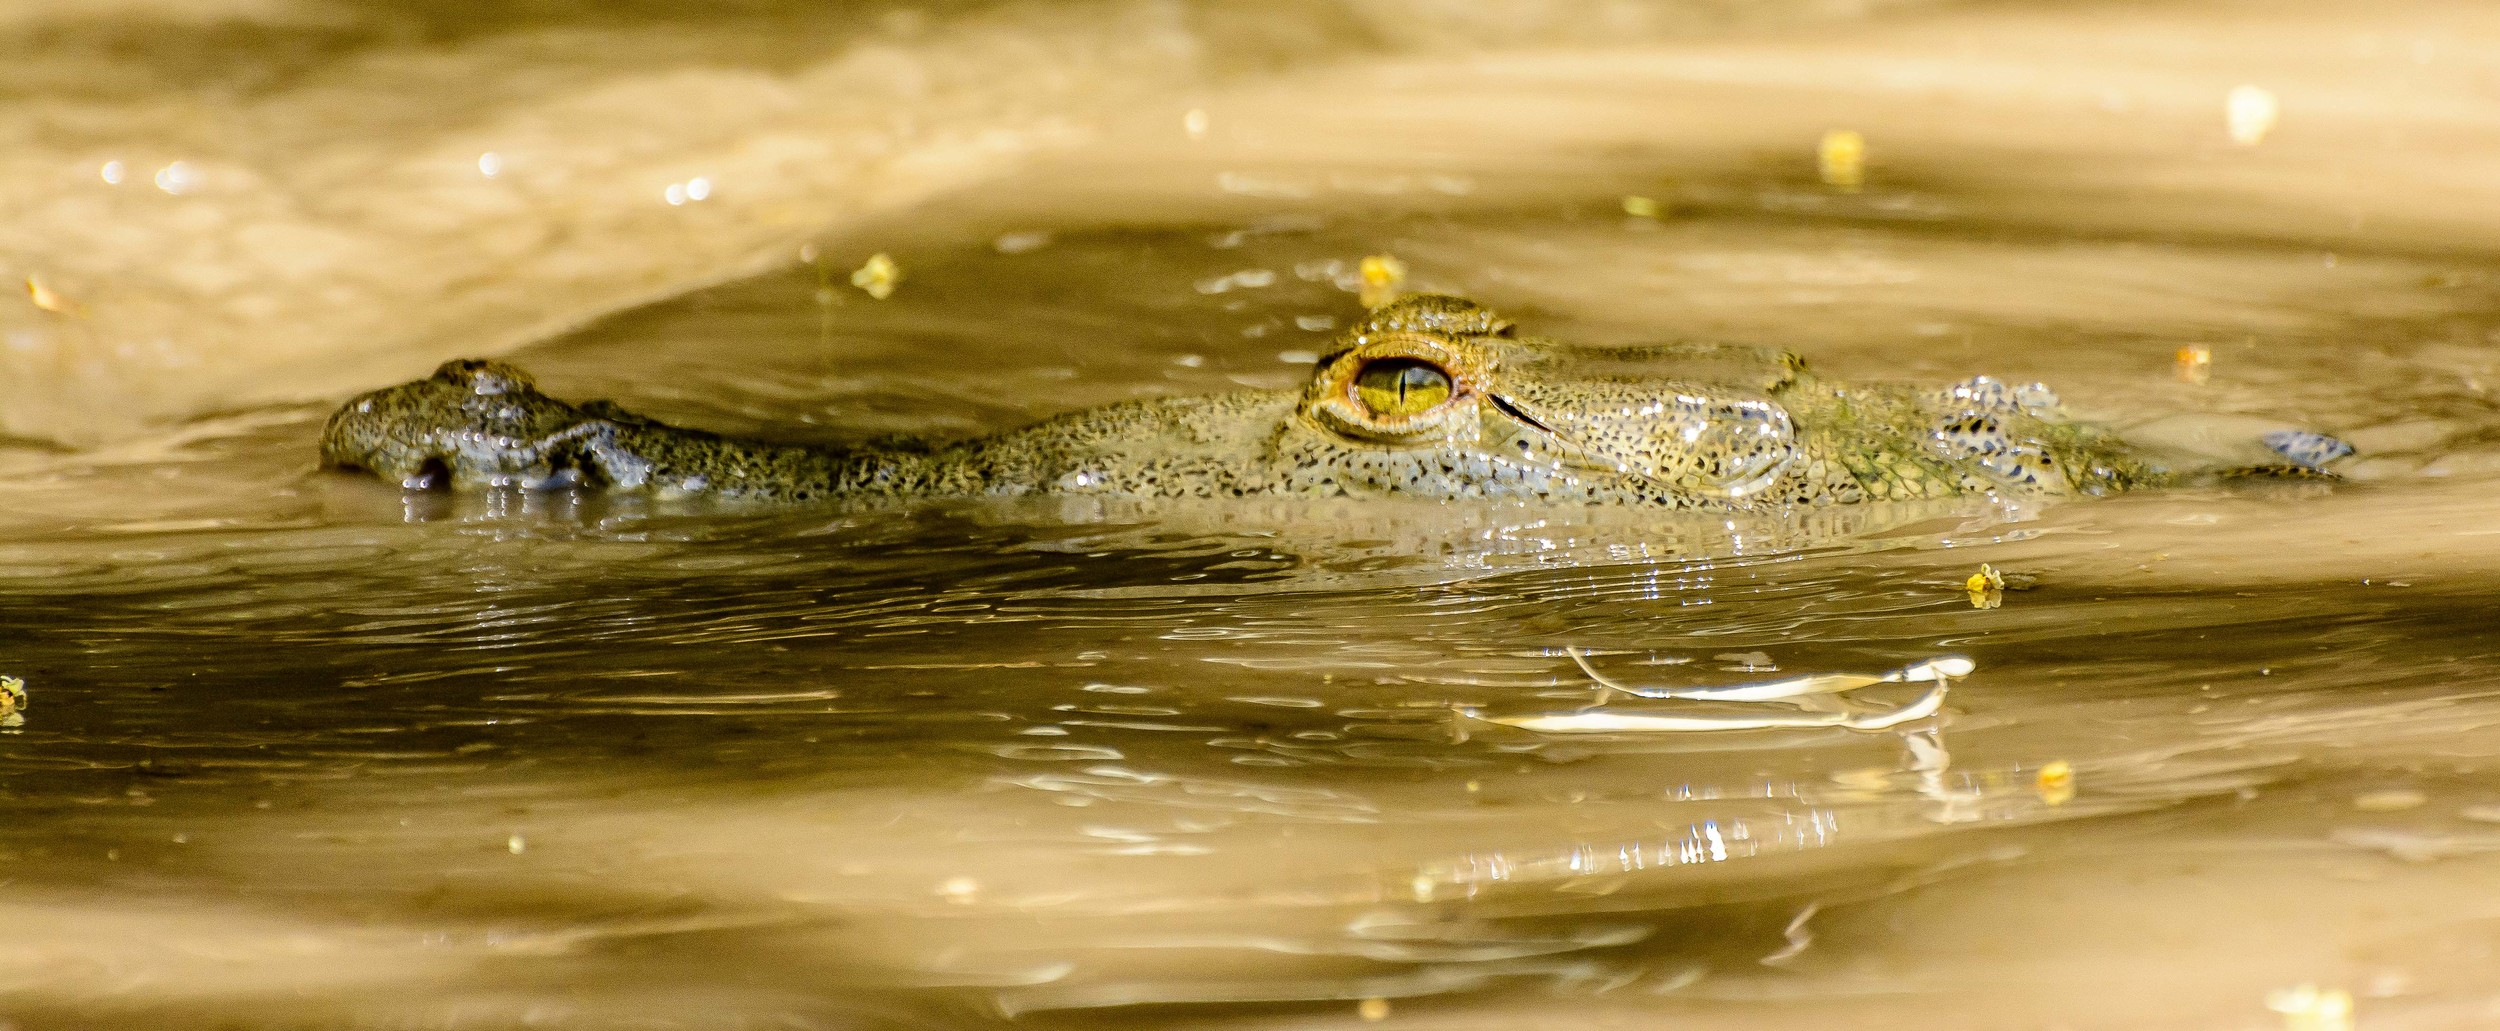 CostaRica Croc.jpg